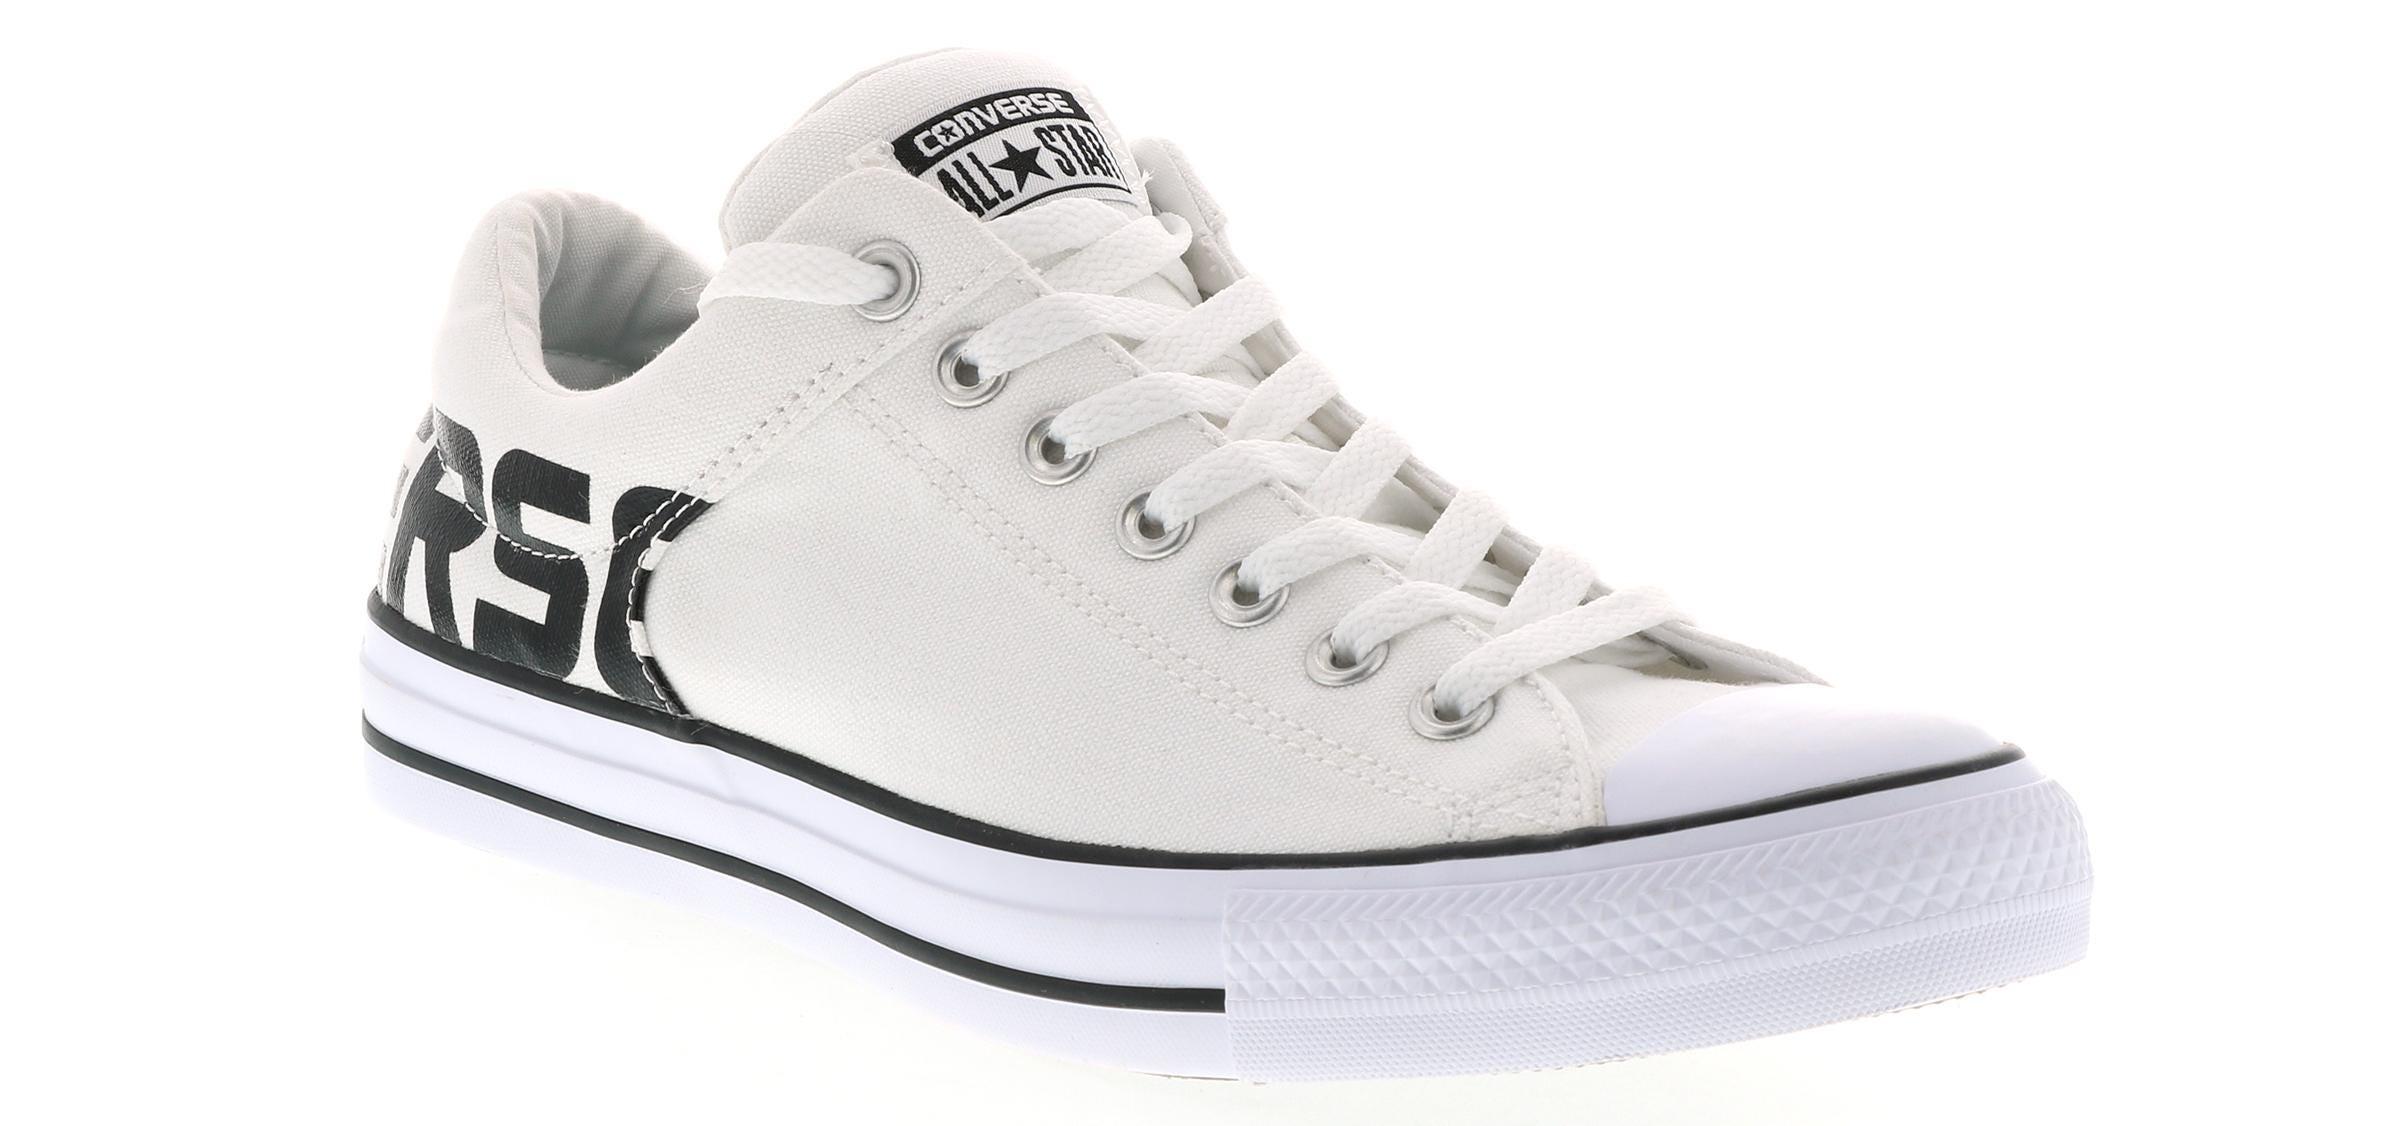 UNISEX Converse Chuck Taylor All Star High Street Ox White